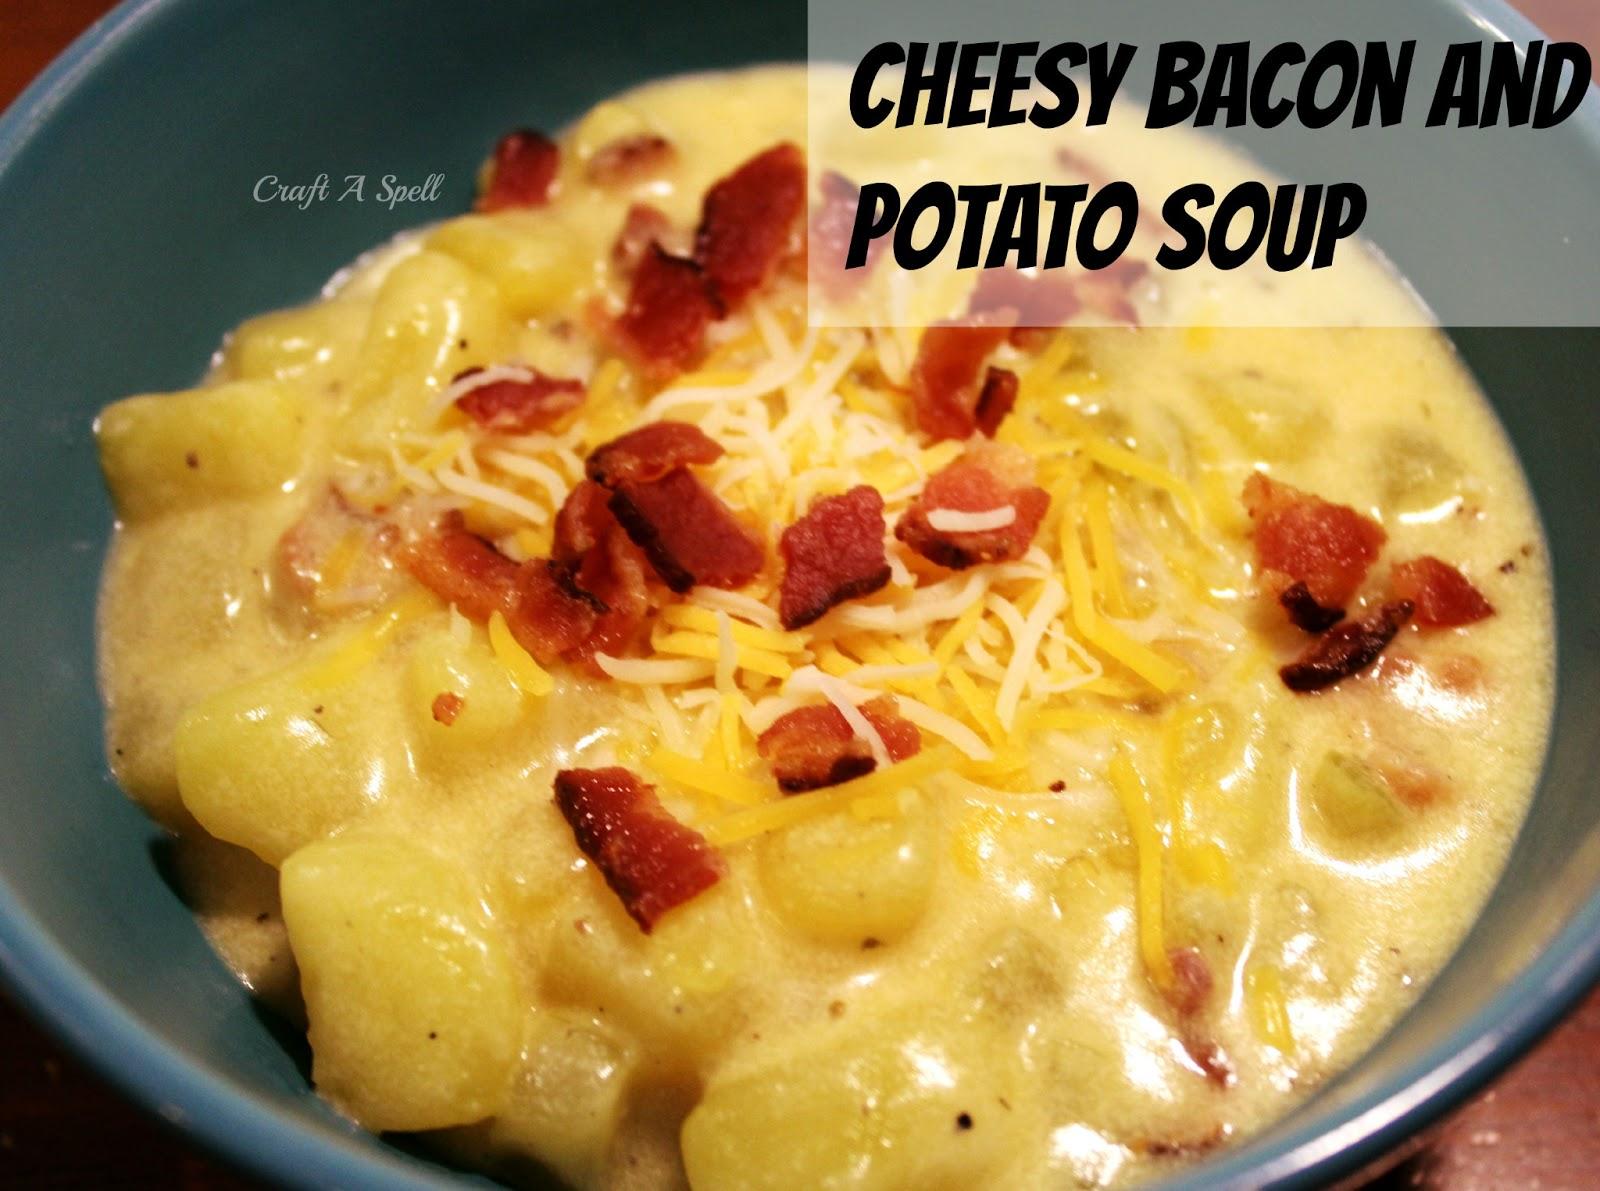 Craft A Spell: Cheesy Bacon and Potato Soup